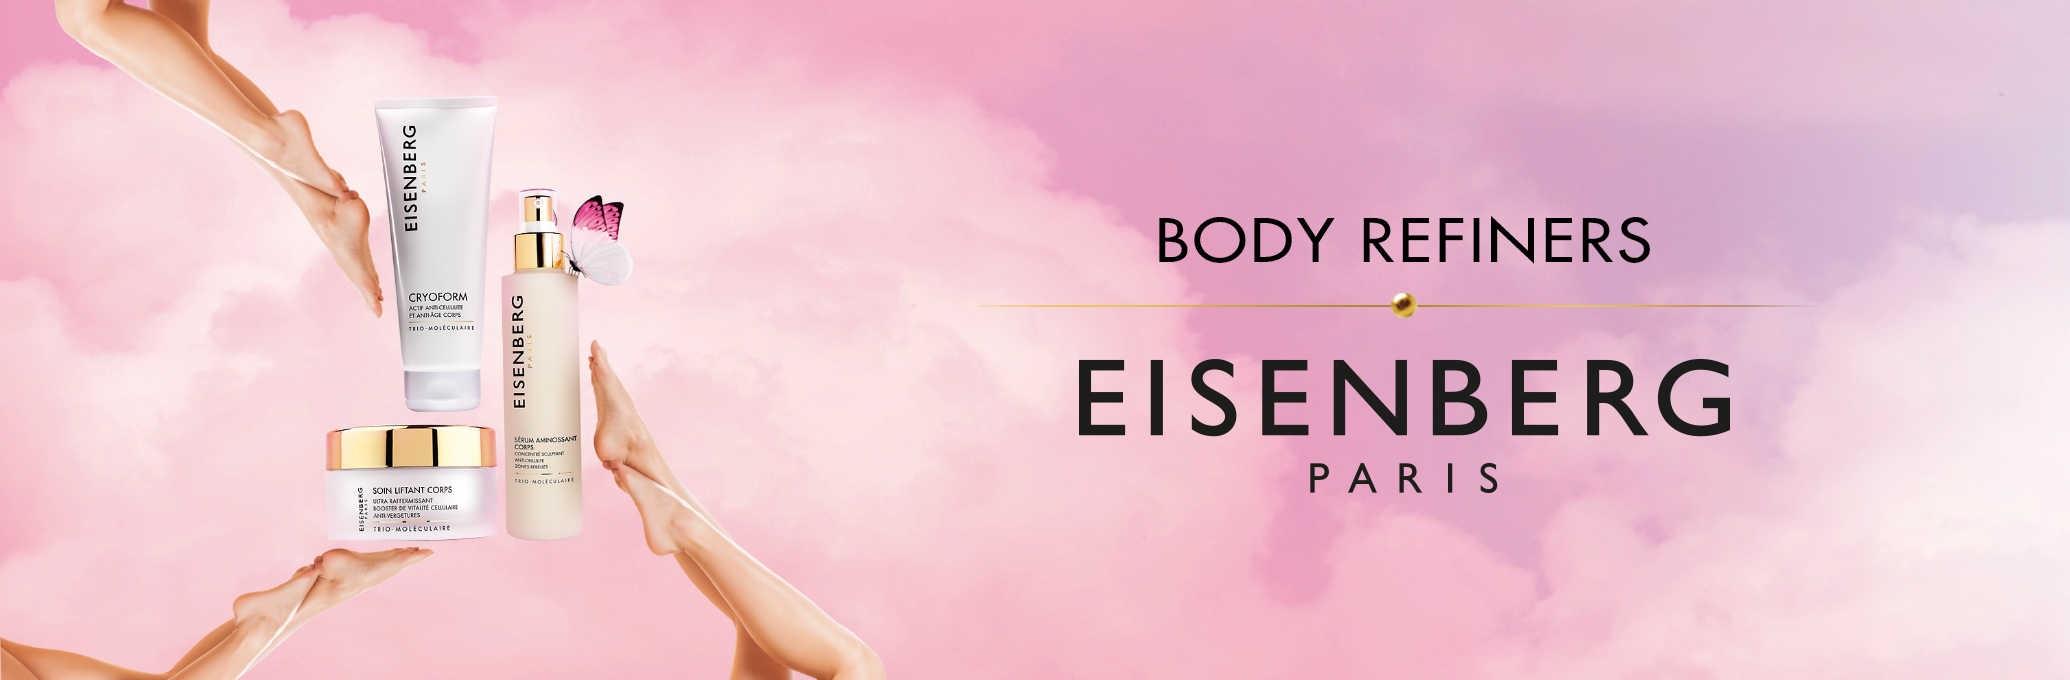 Eisenberg Body Refiners}